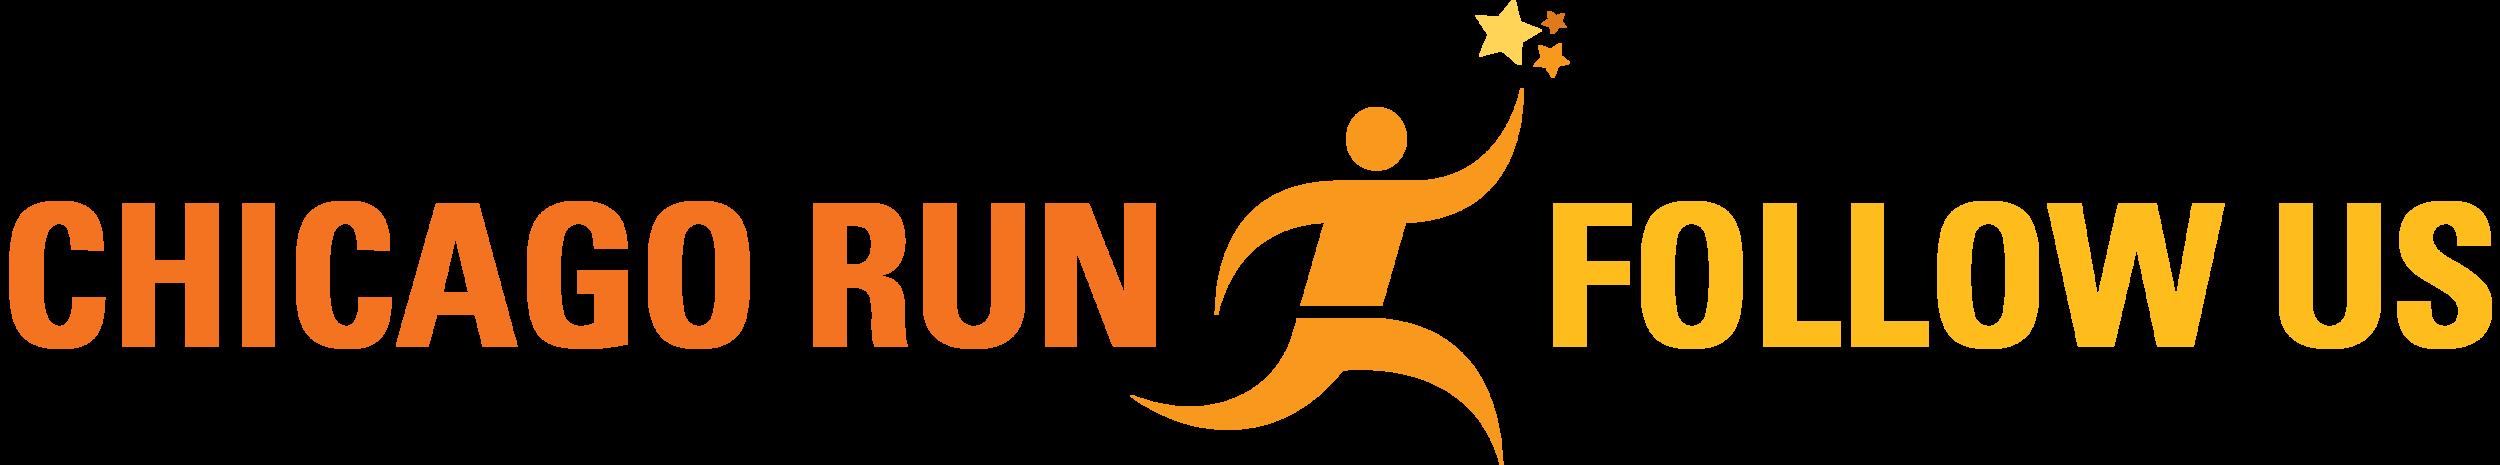 Chicago Run Banner - follow us.png